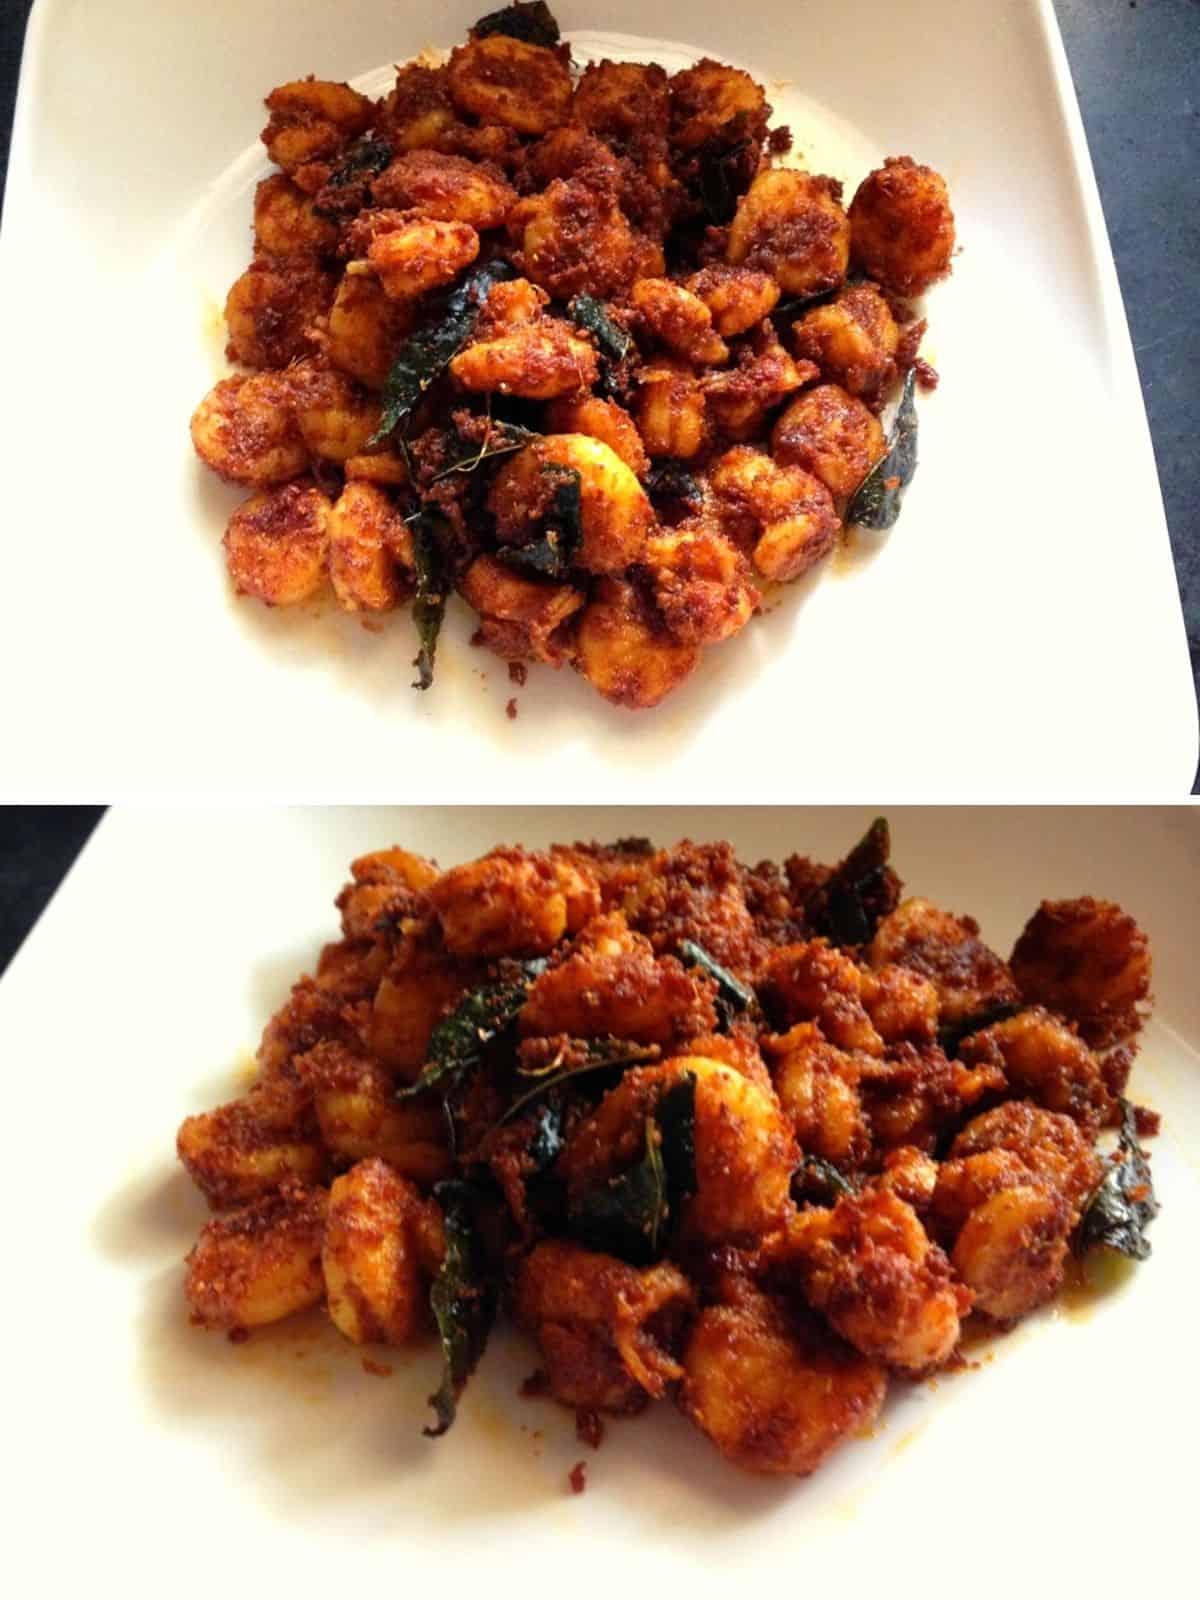 stir fried prawn on a plate